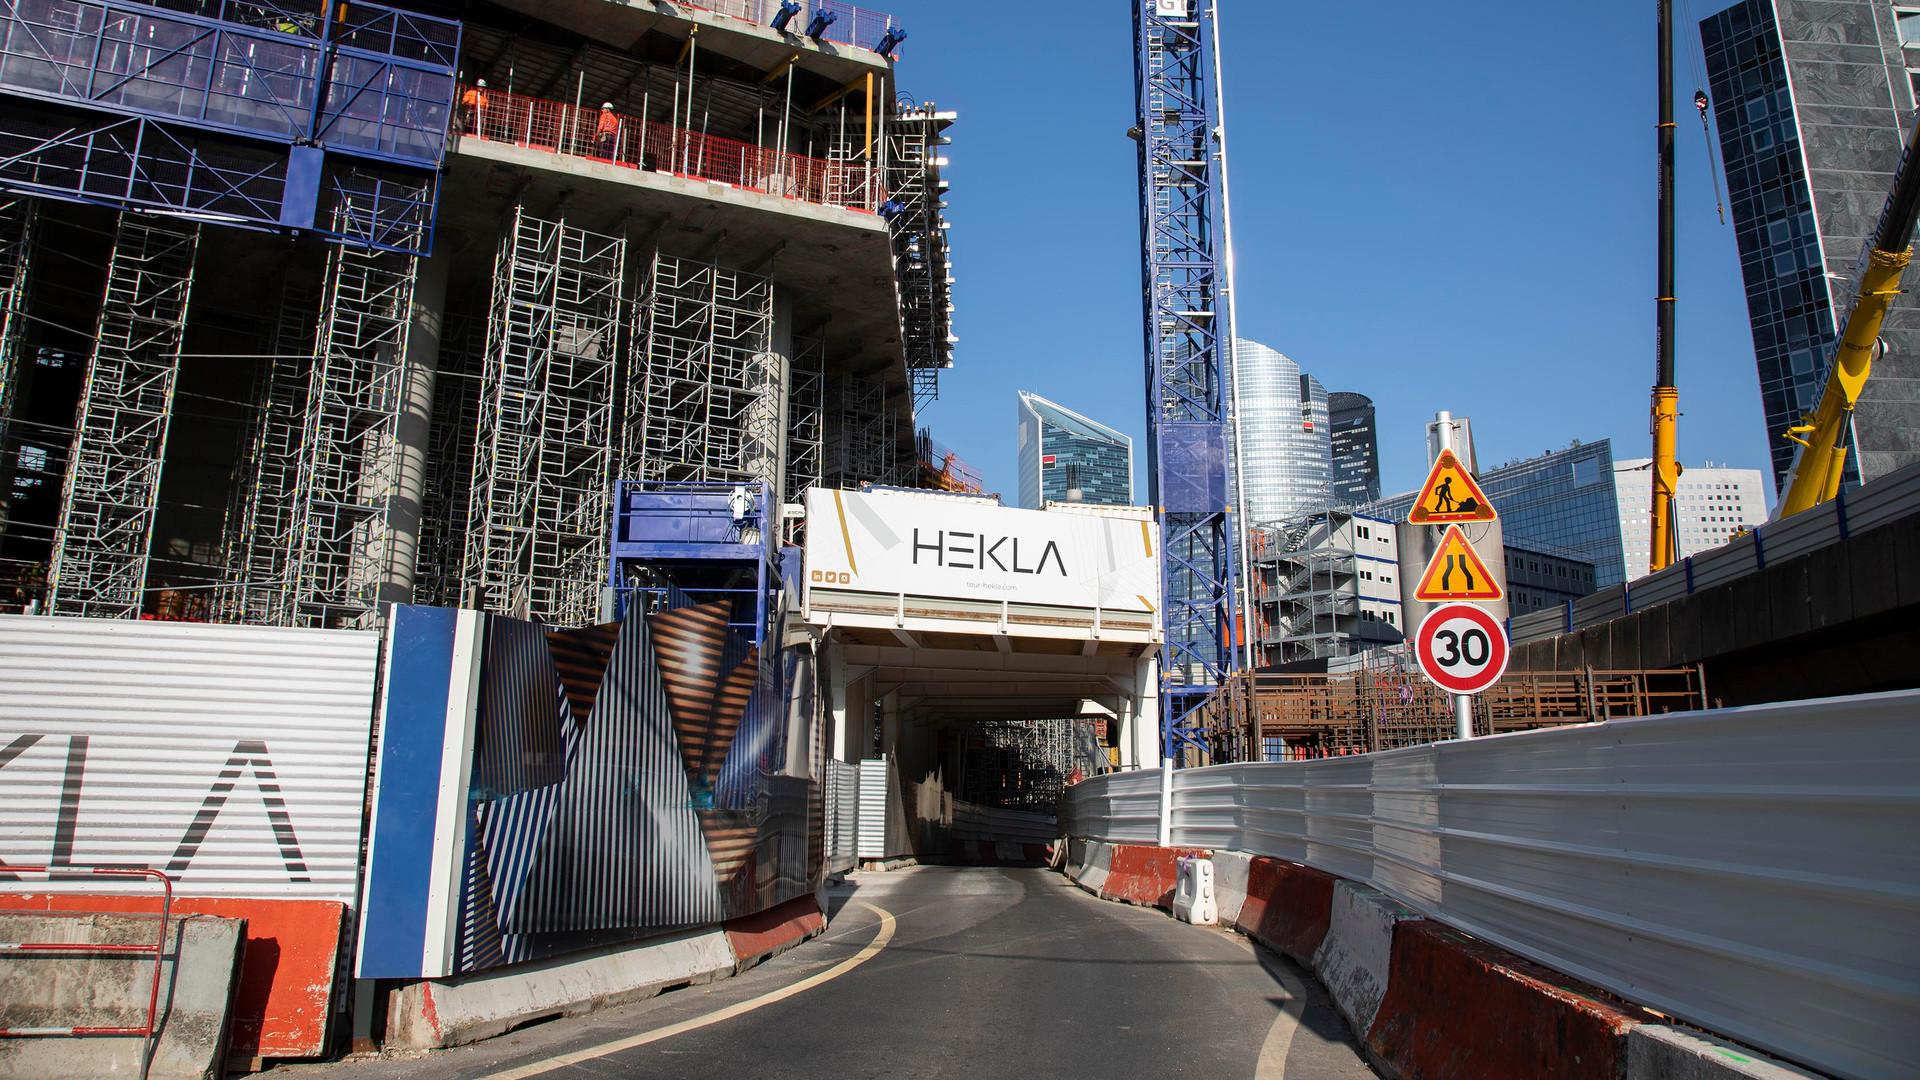 Tour Hekla, Paris La Défense - France